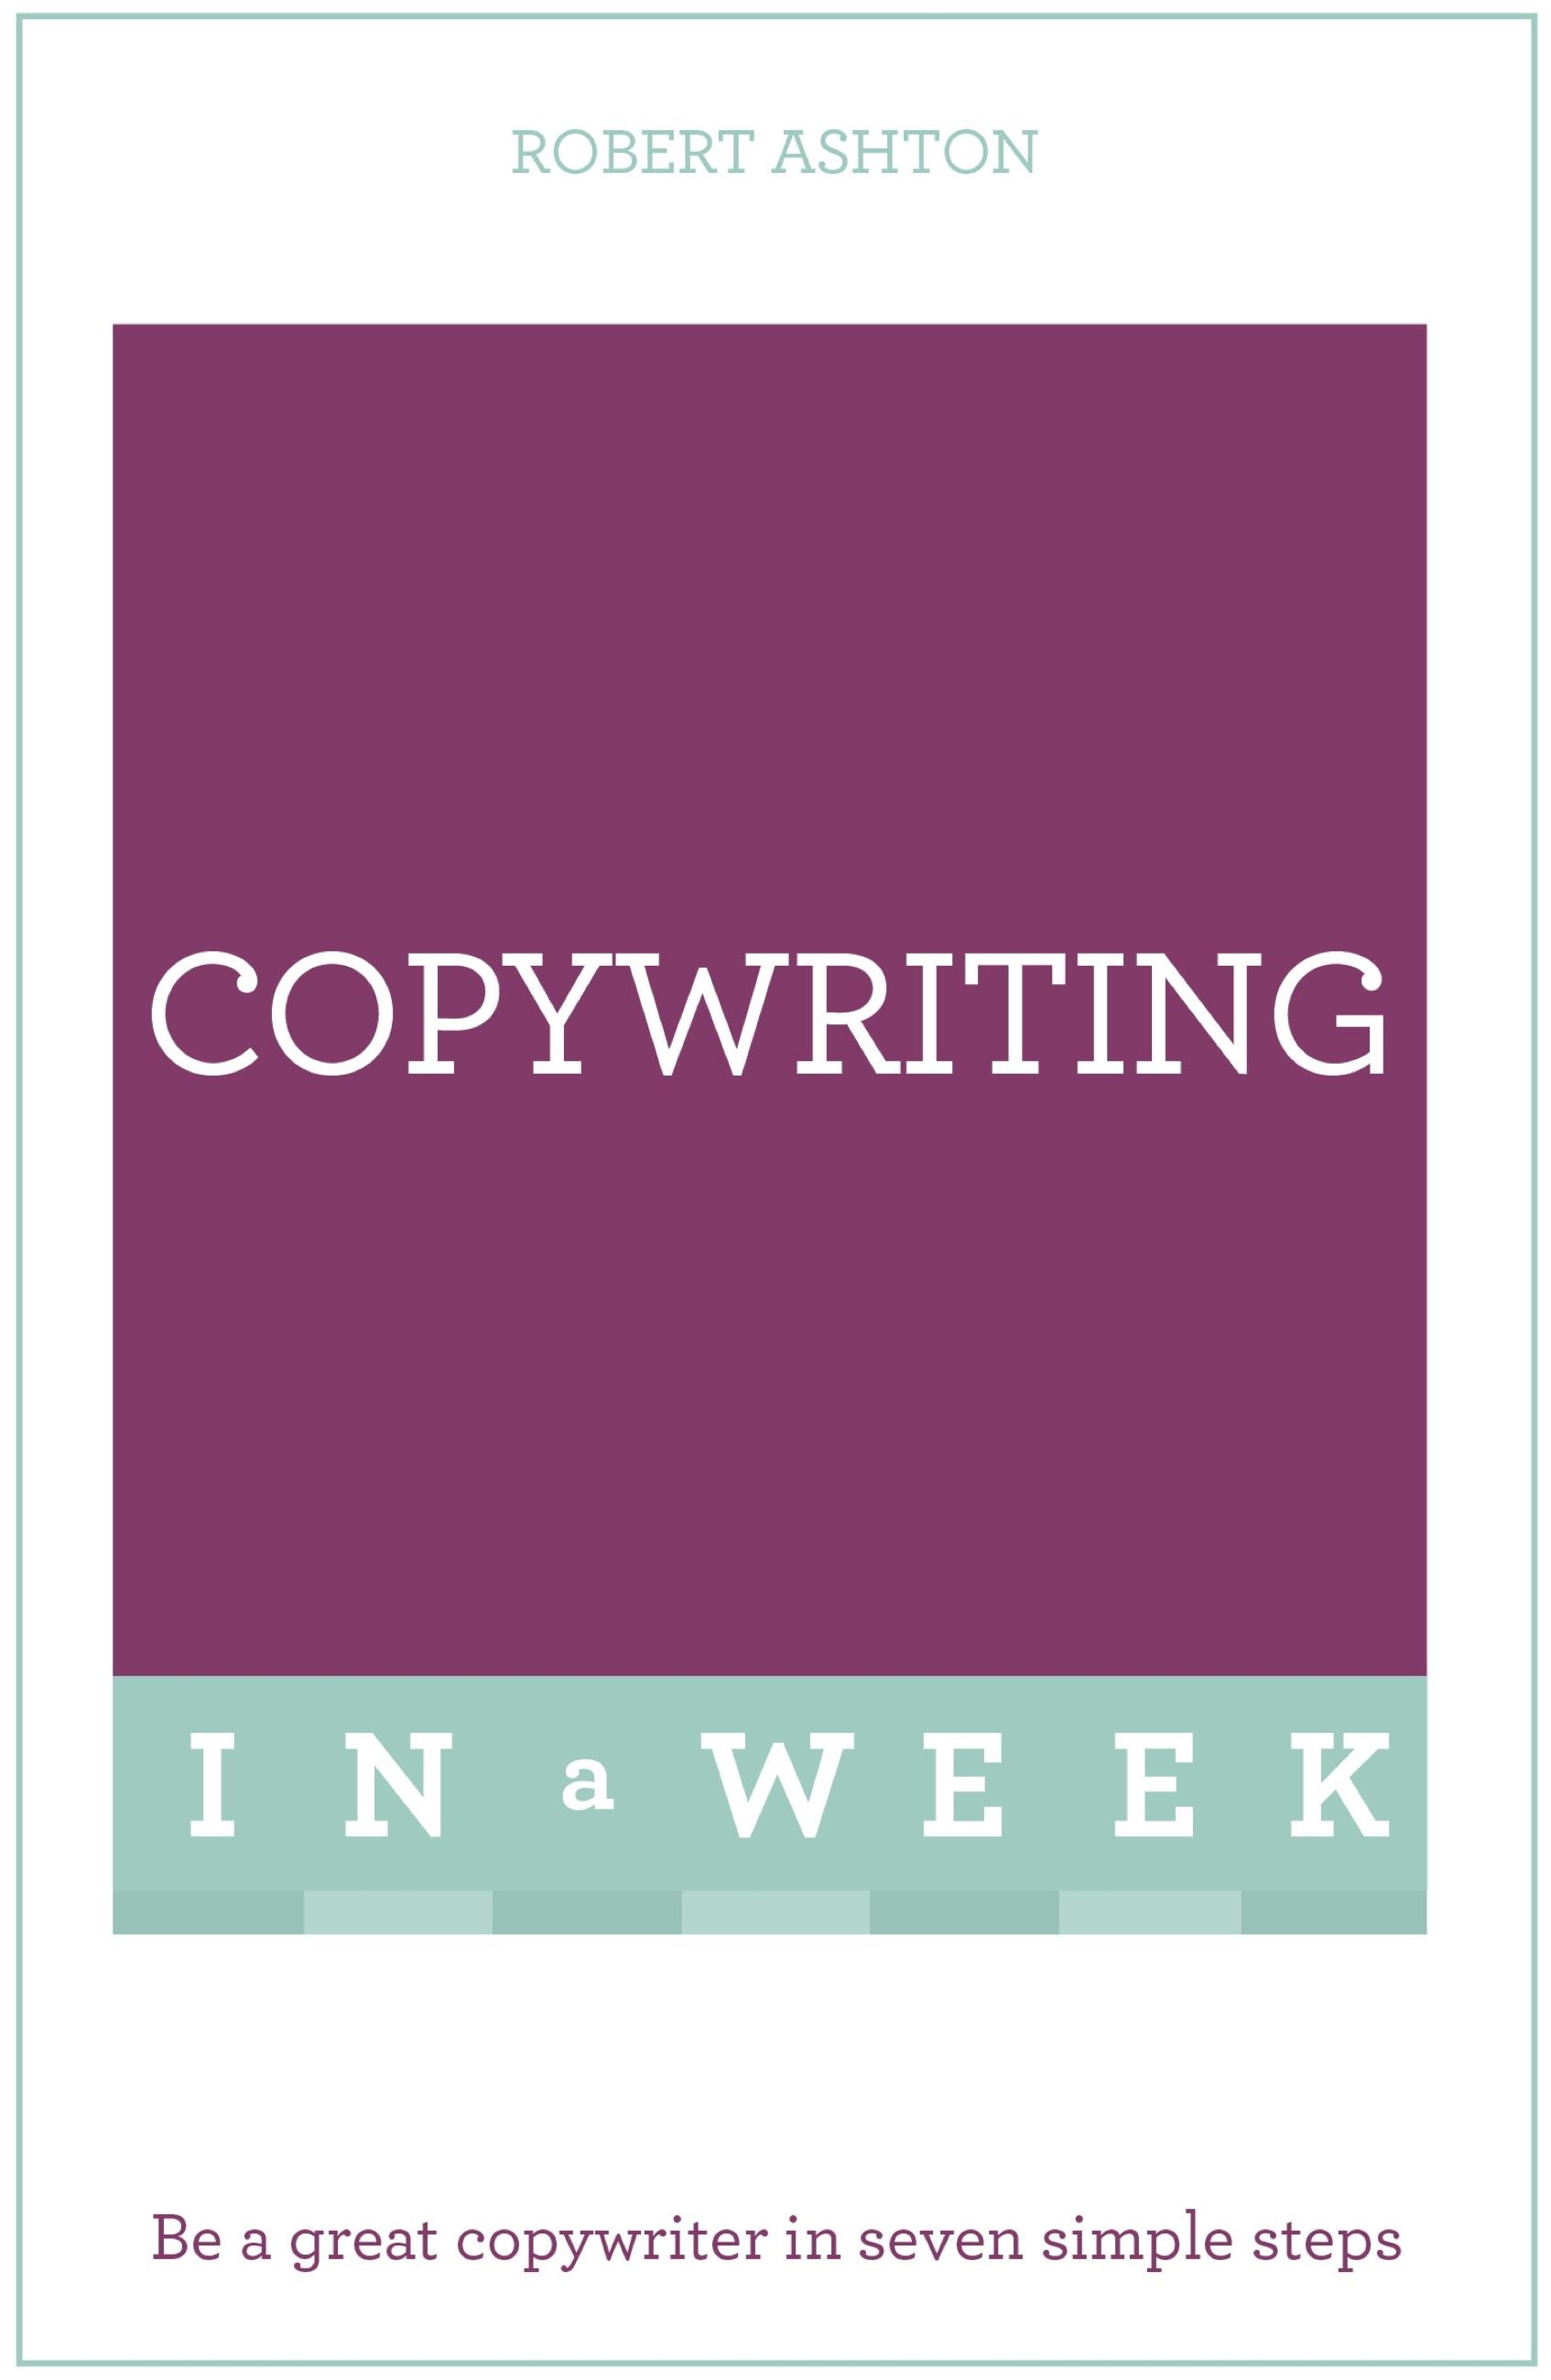 Download Ebook Copywriting In A Week by Robert Ashton Pdf